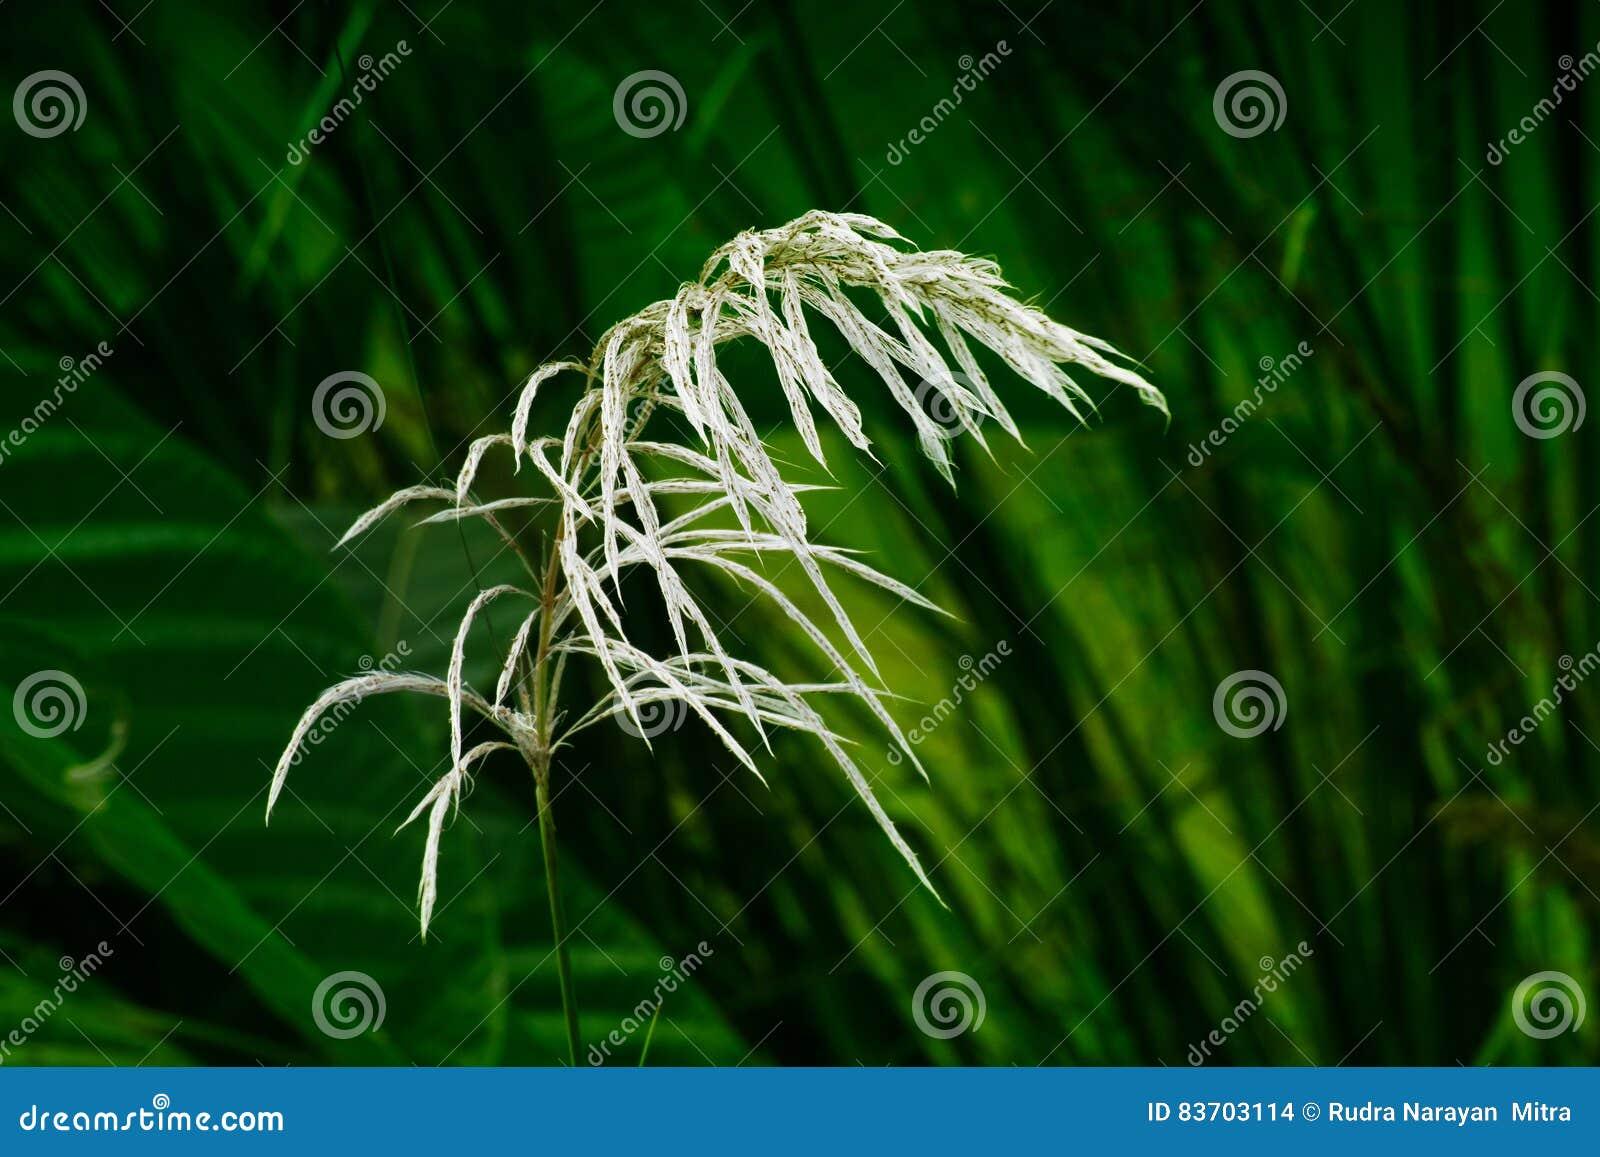 Kans Grass , Saccharum Spontaneum, Kolkata, West Bengal, India Stock Photo